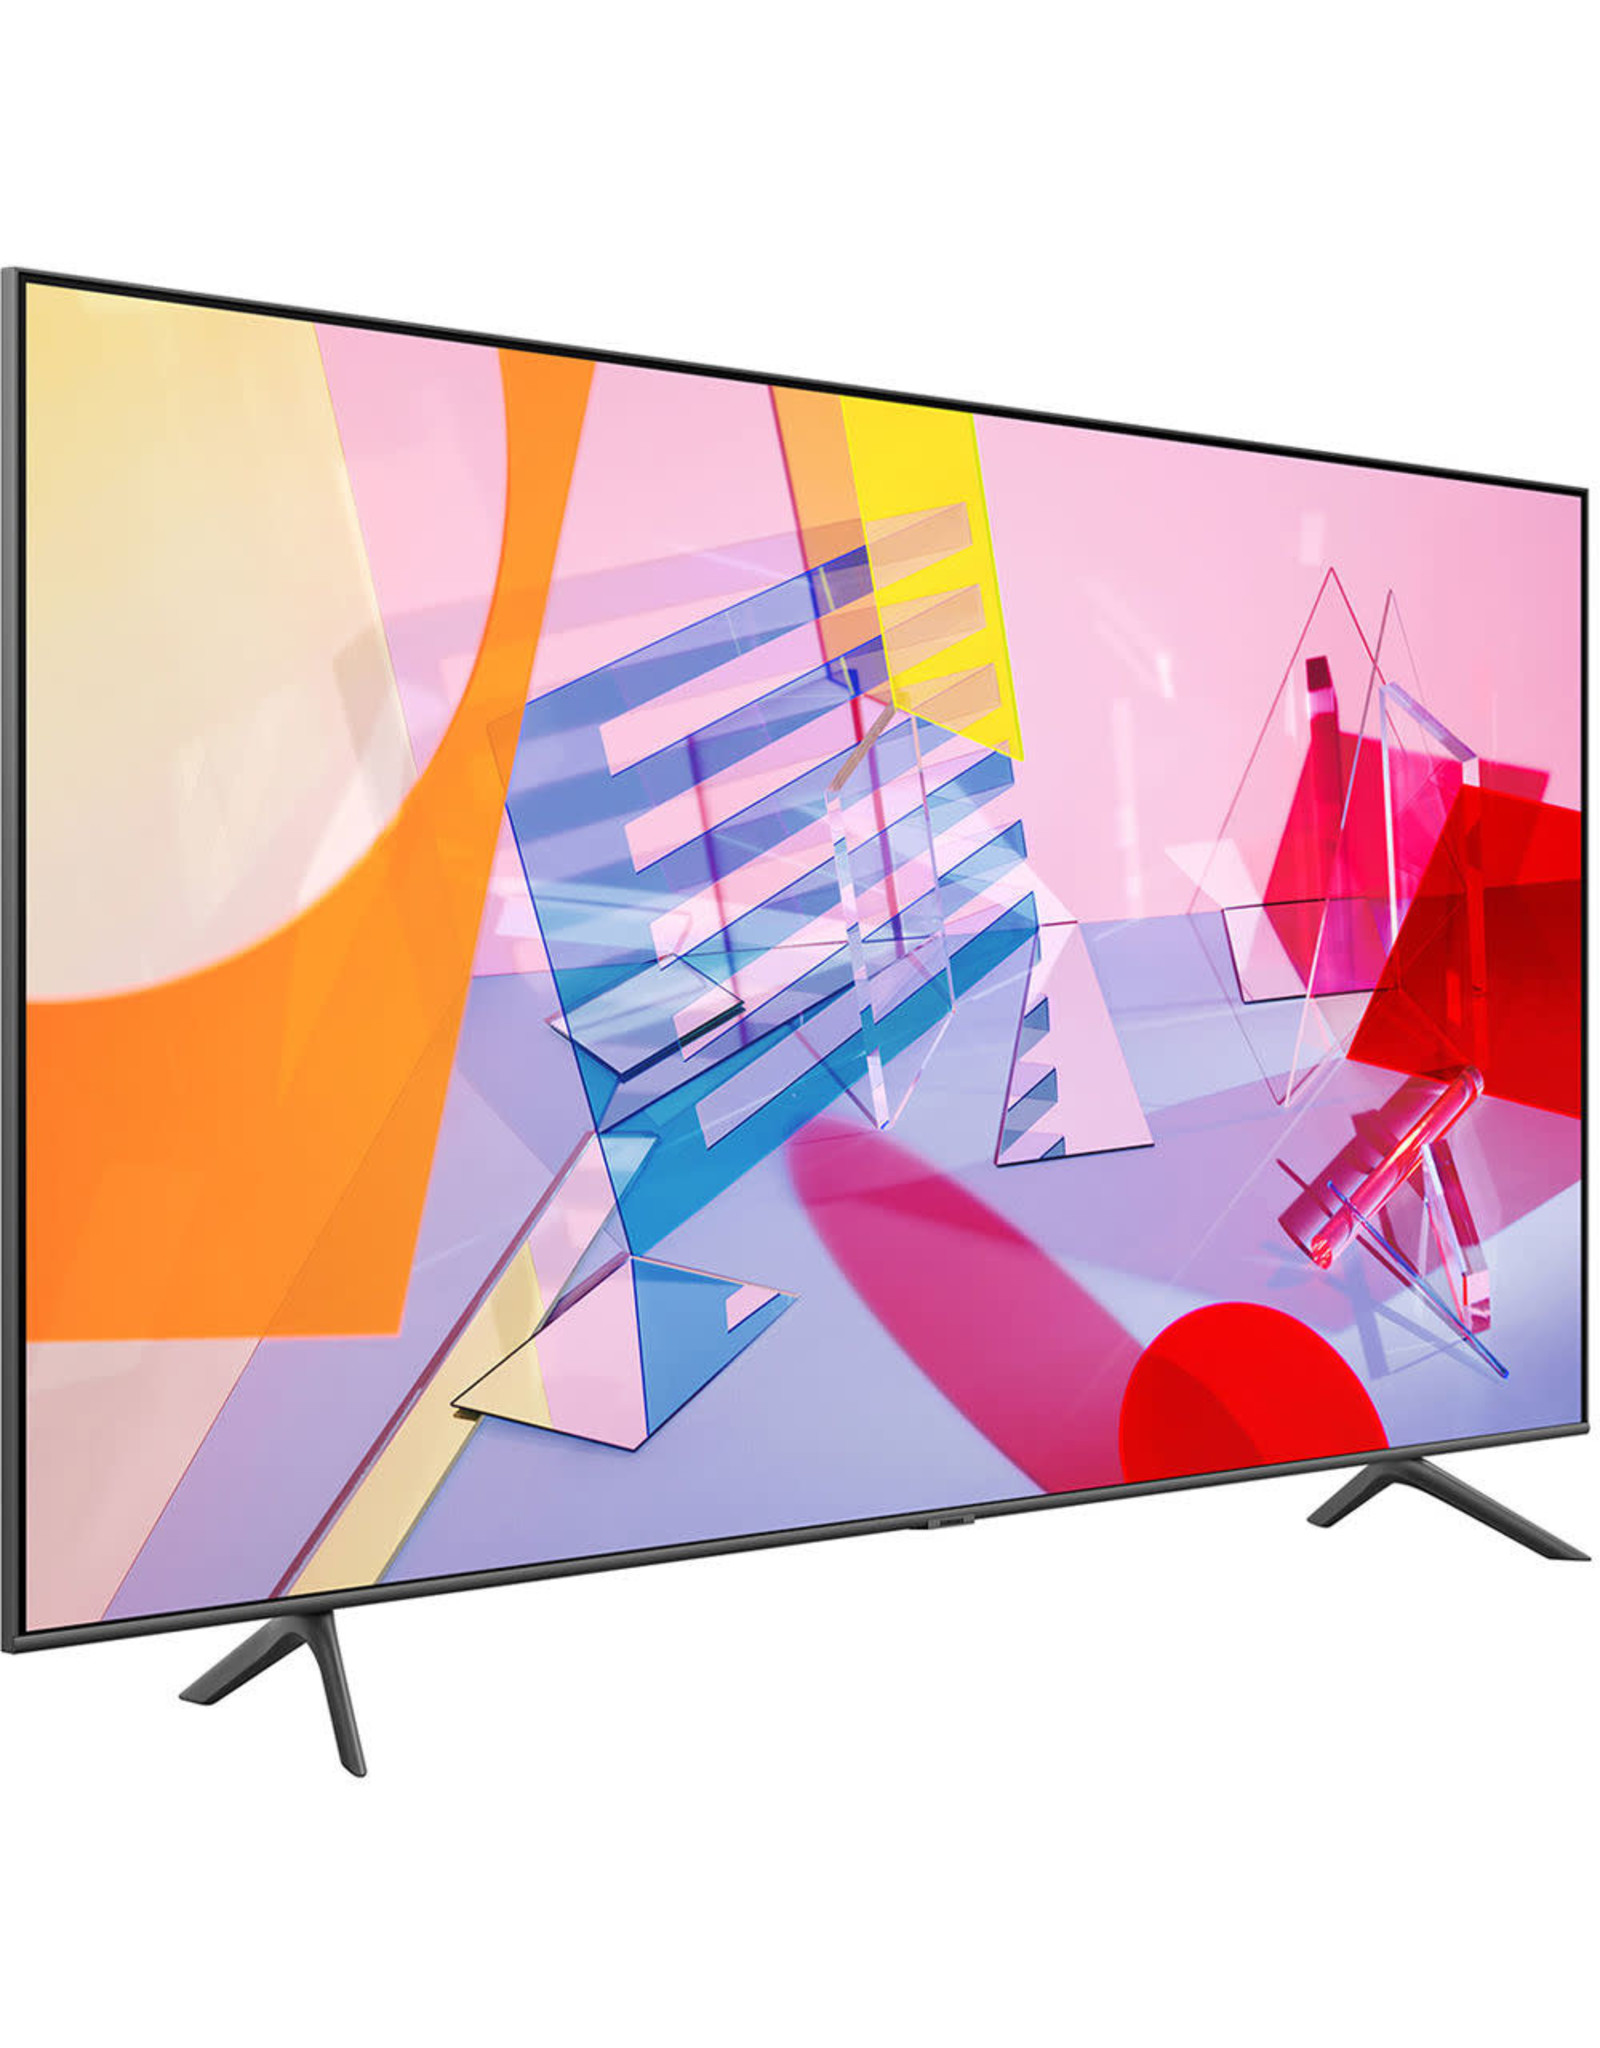 "SAMSUNG QN75Q60TAFXZA Samsung - 75"" Class Q60T Series QLED 4K UHD Smart Tizen TV"